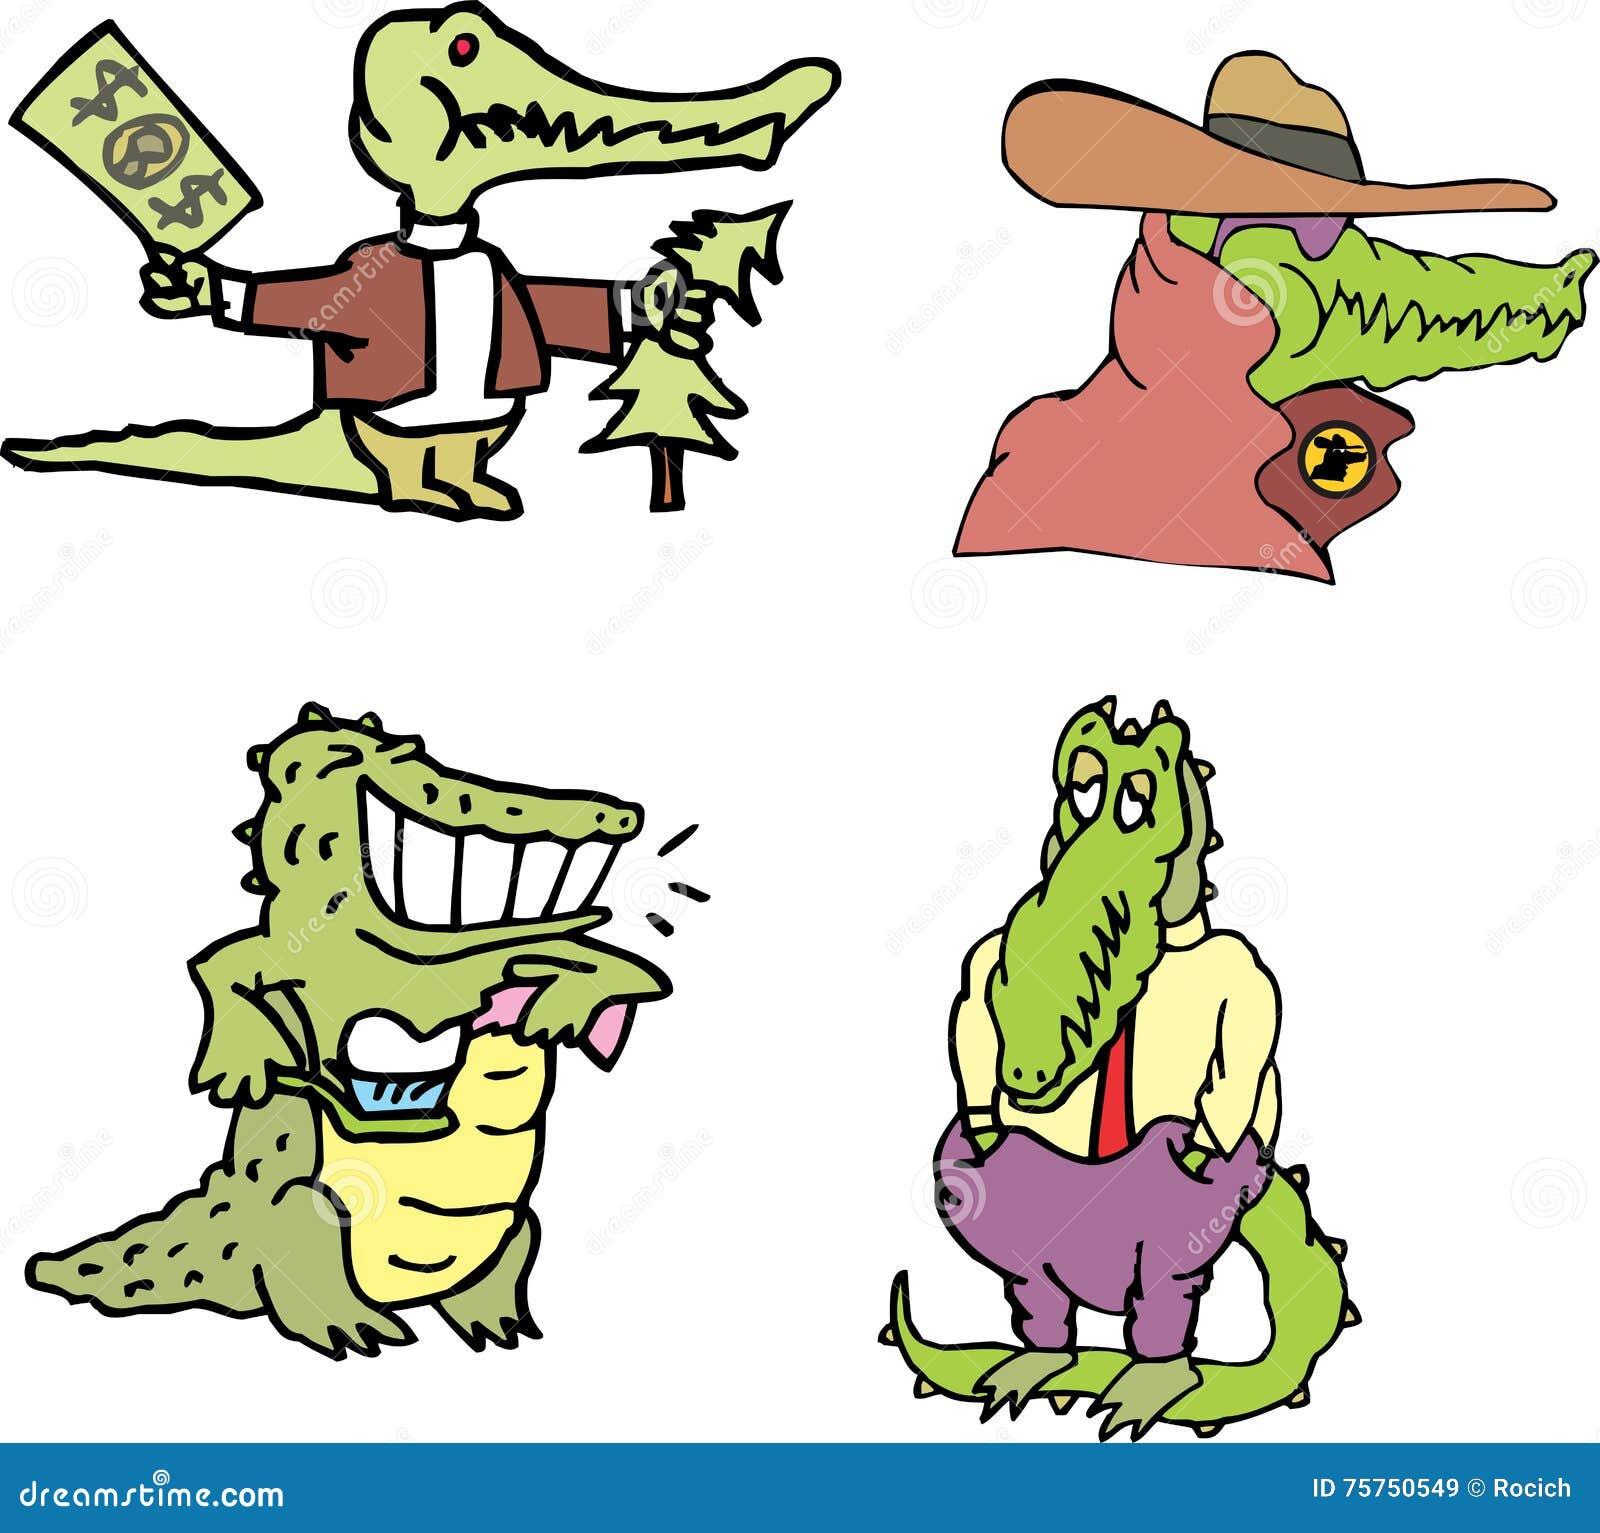 Grupo de cômico humano-como jacarés (crocomen)